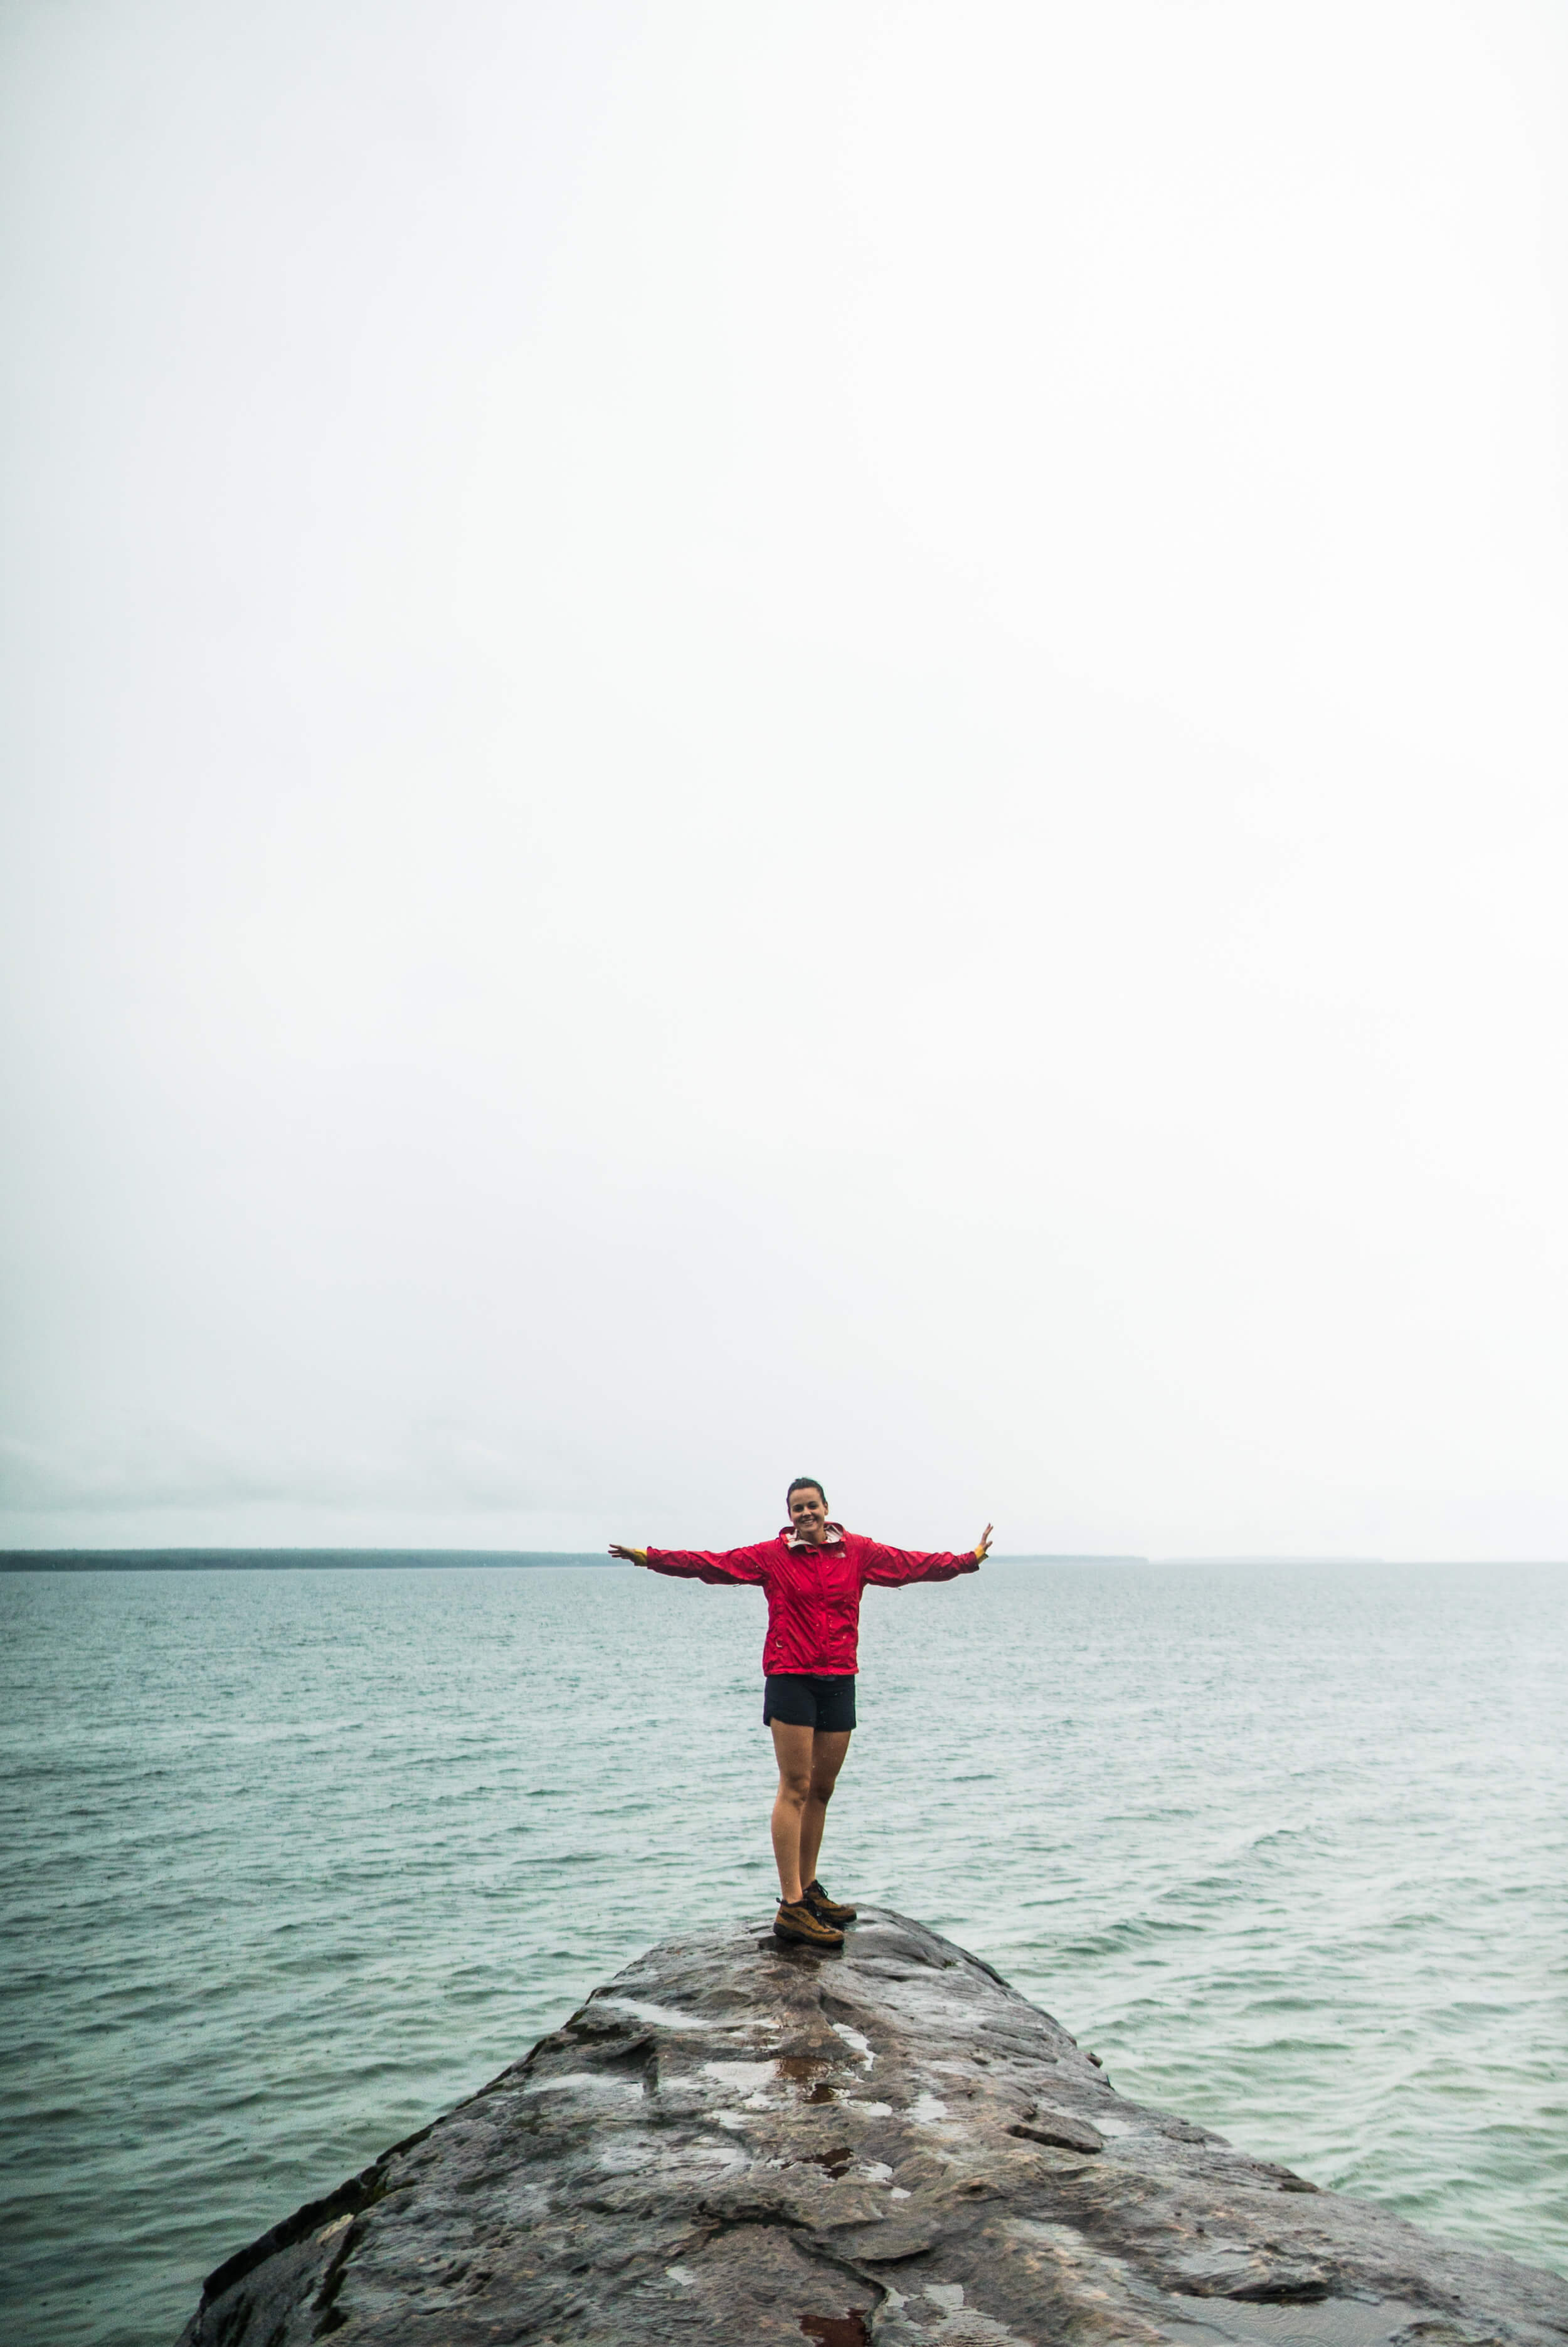 engle-olson-photography-madeline-island-22.jpg